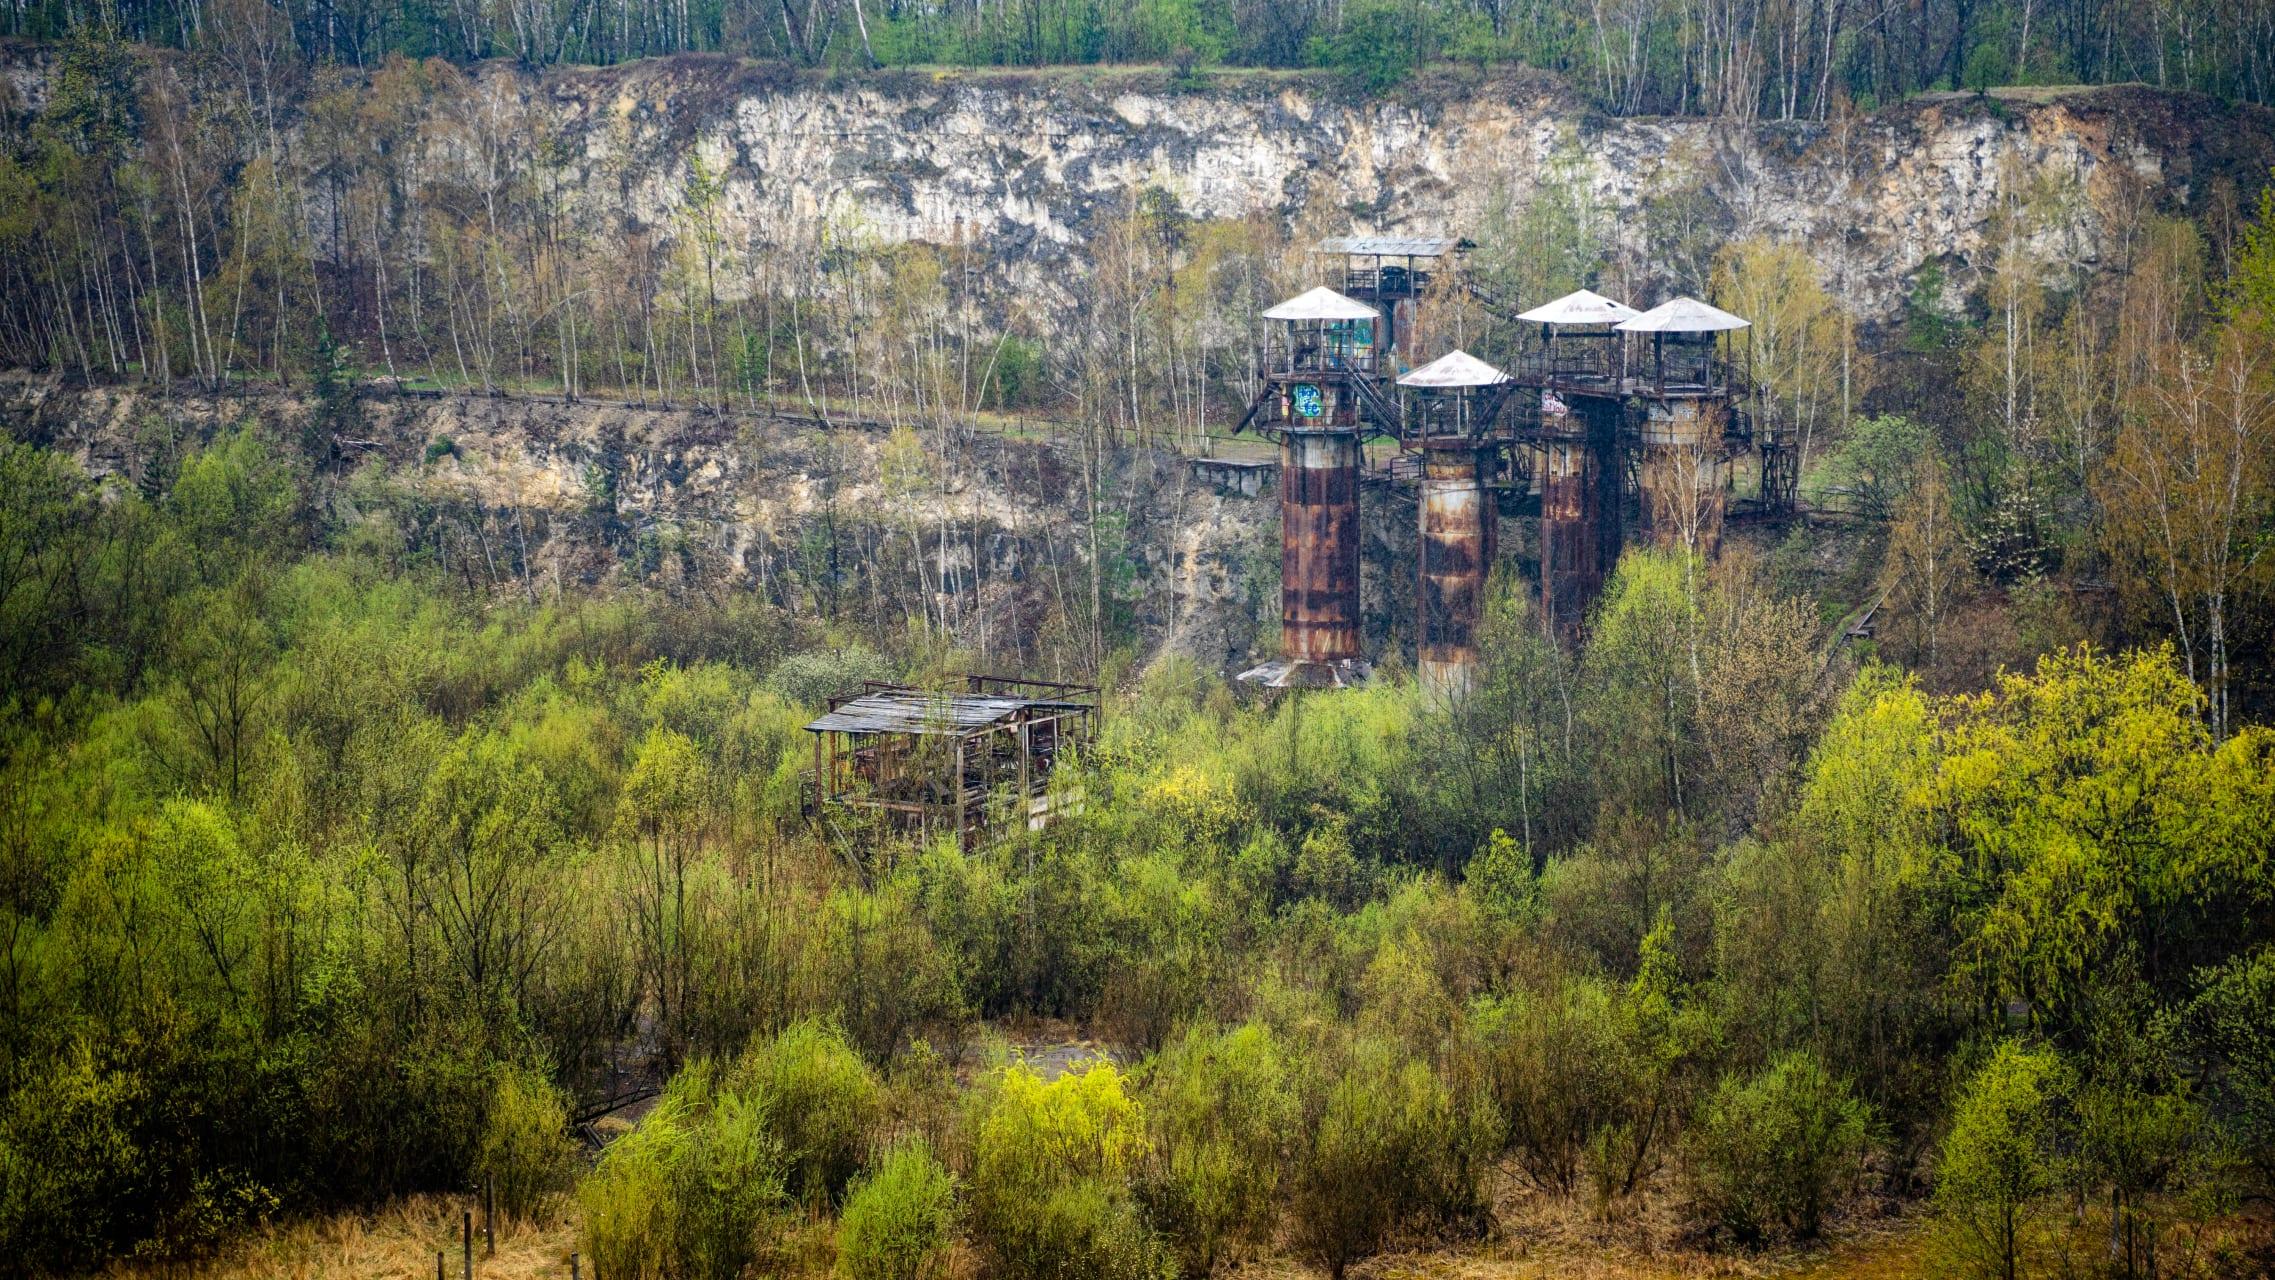 Krakow - Liban Quarry - The Grand Escape